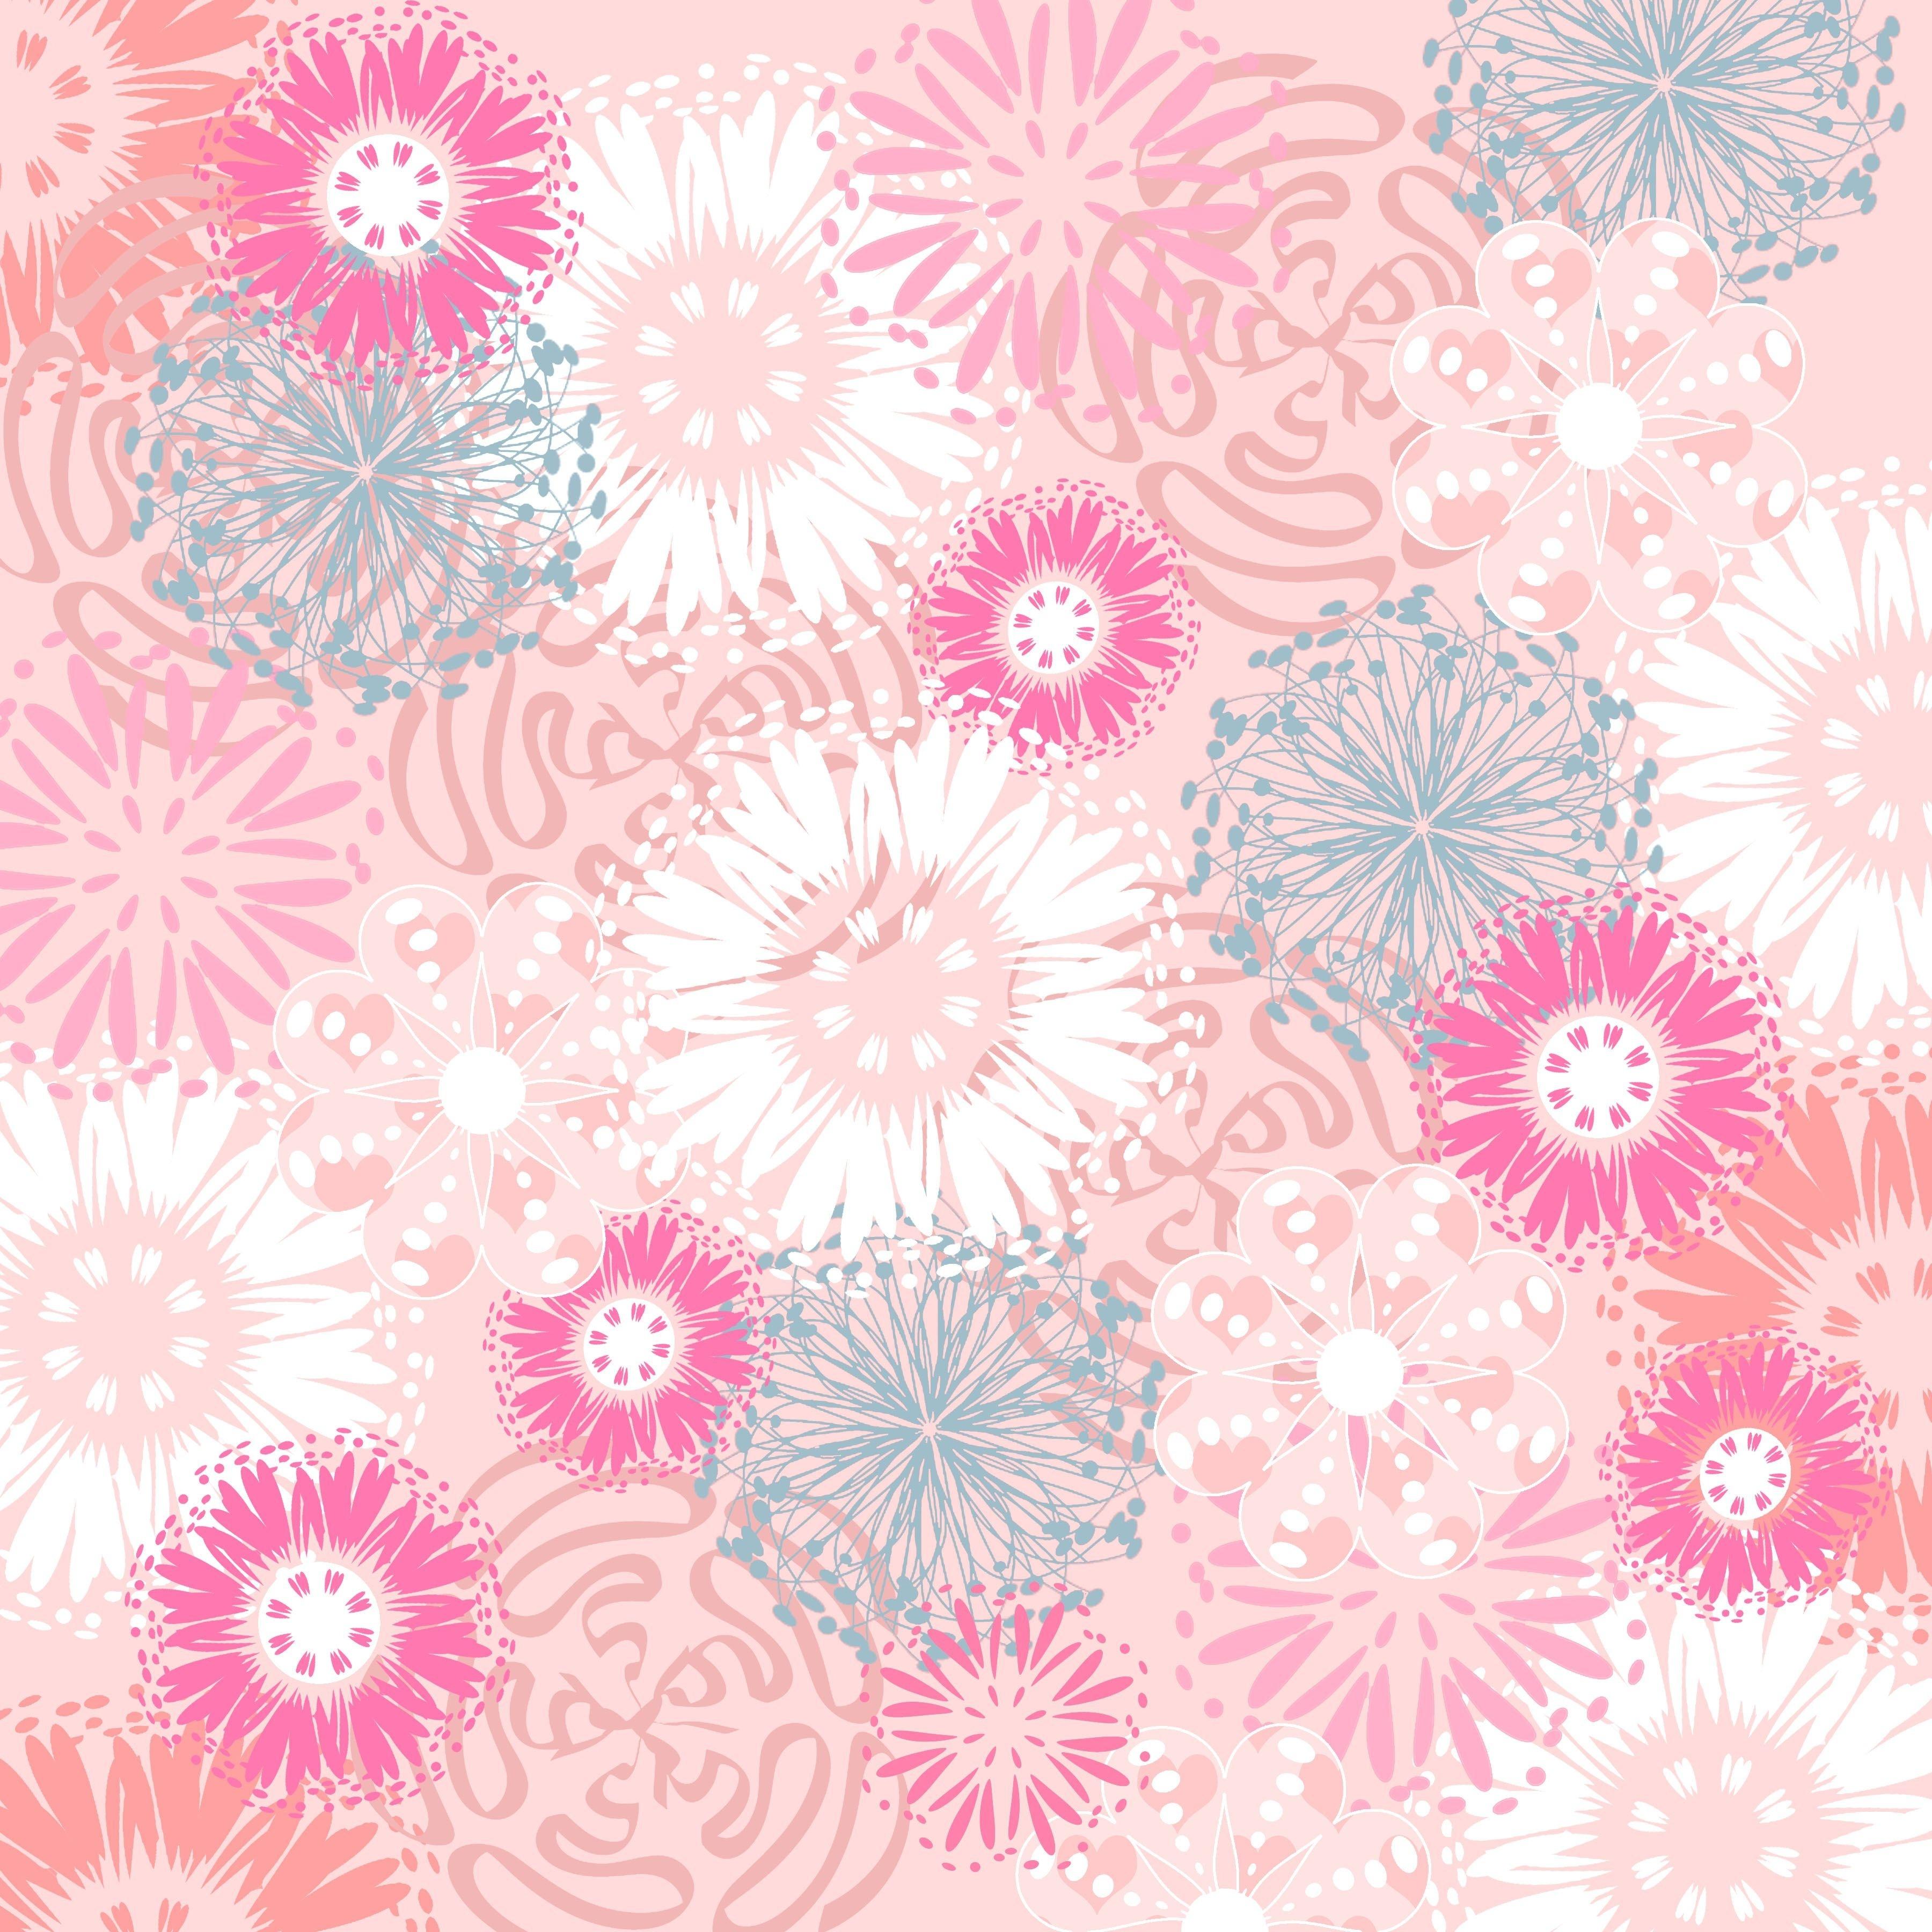 Scrapbook Backgrounds Printables Free Printable Scrapbook Paper - Free Printable Fall Scrapbook Paper